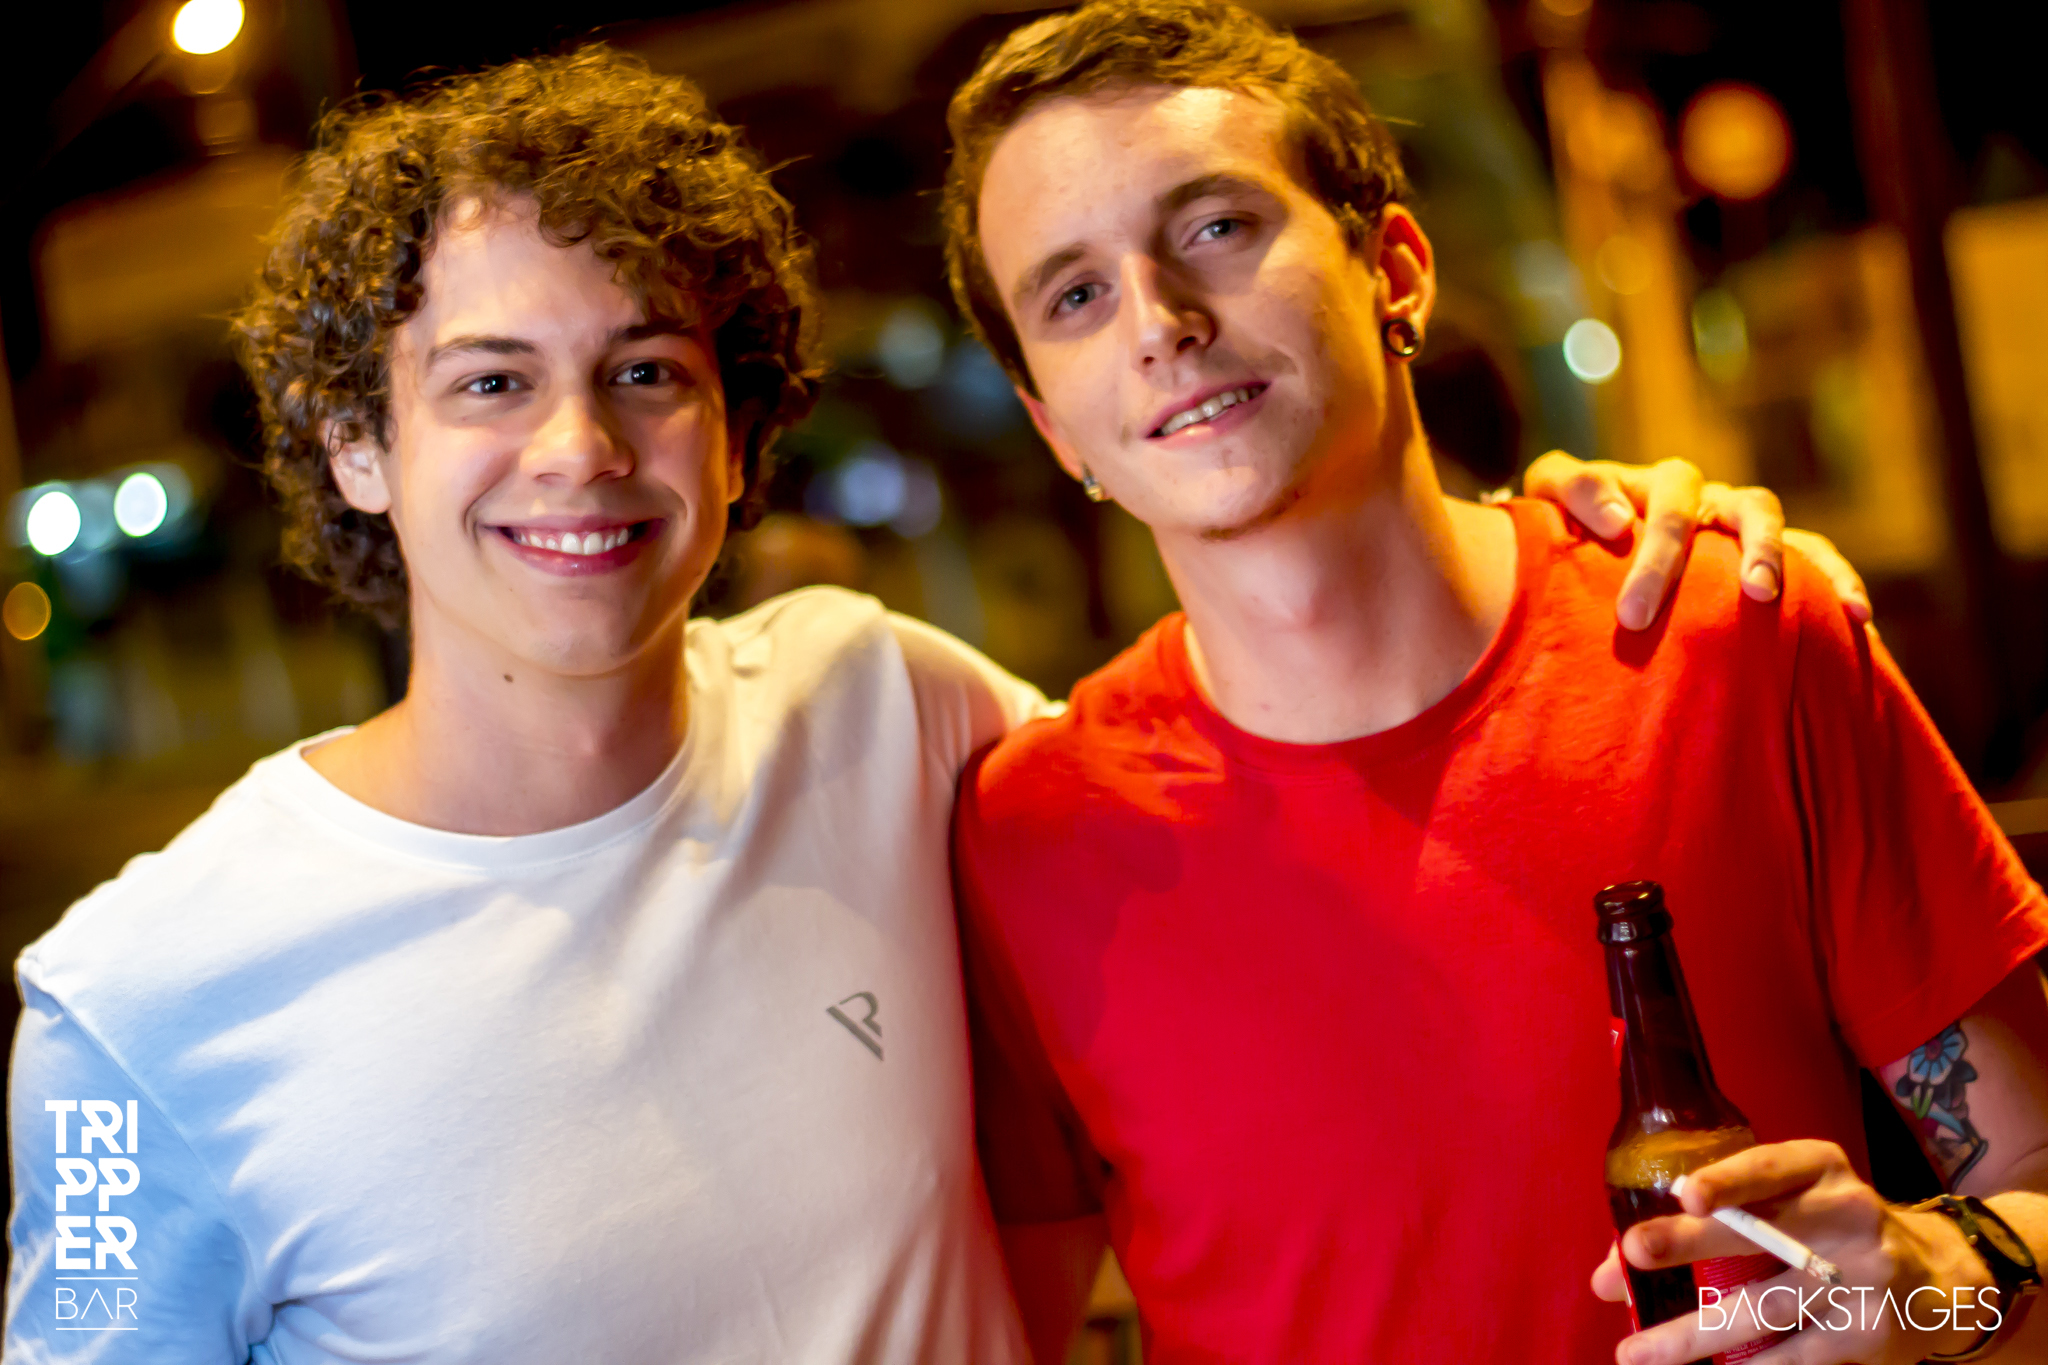 tripper-sorocaba-foto-kenzi-marinho-revista-backstages (25)